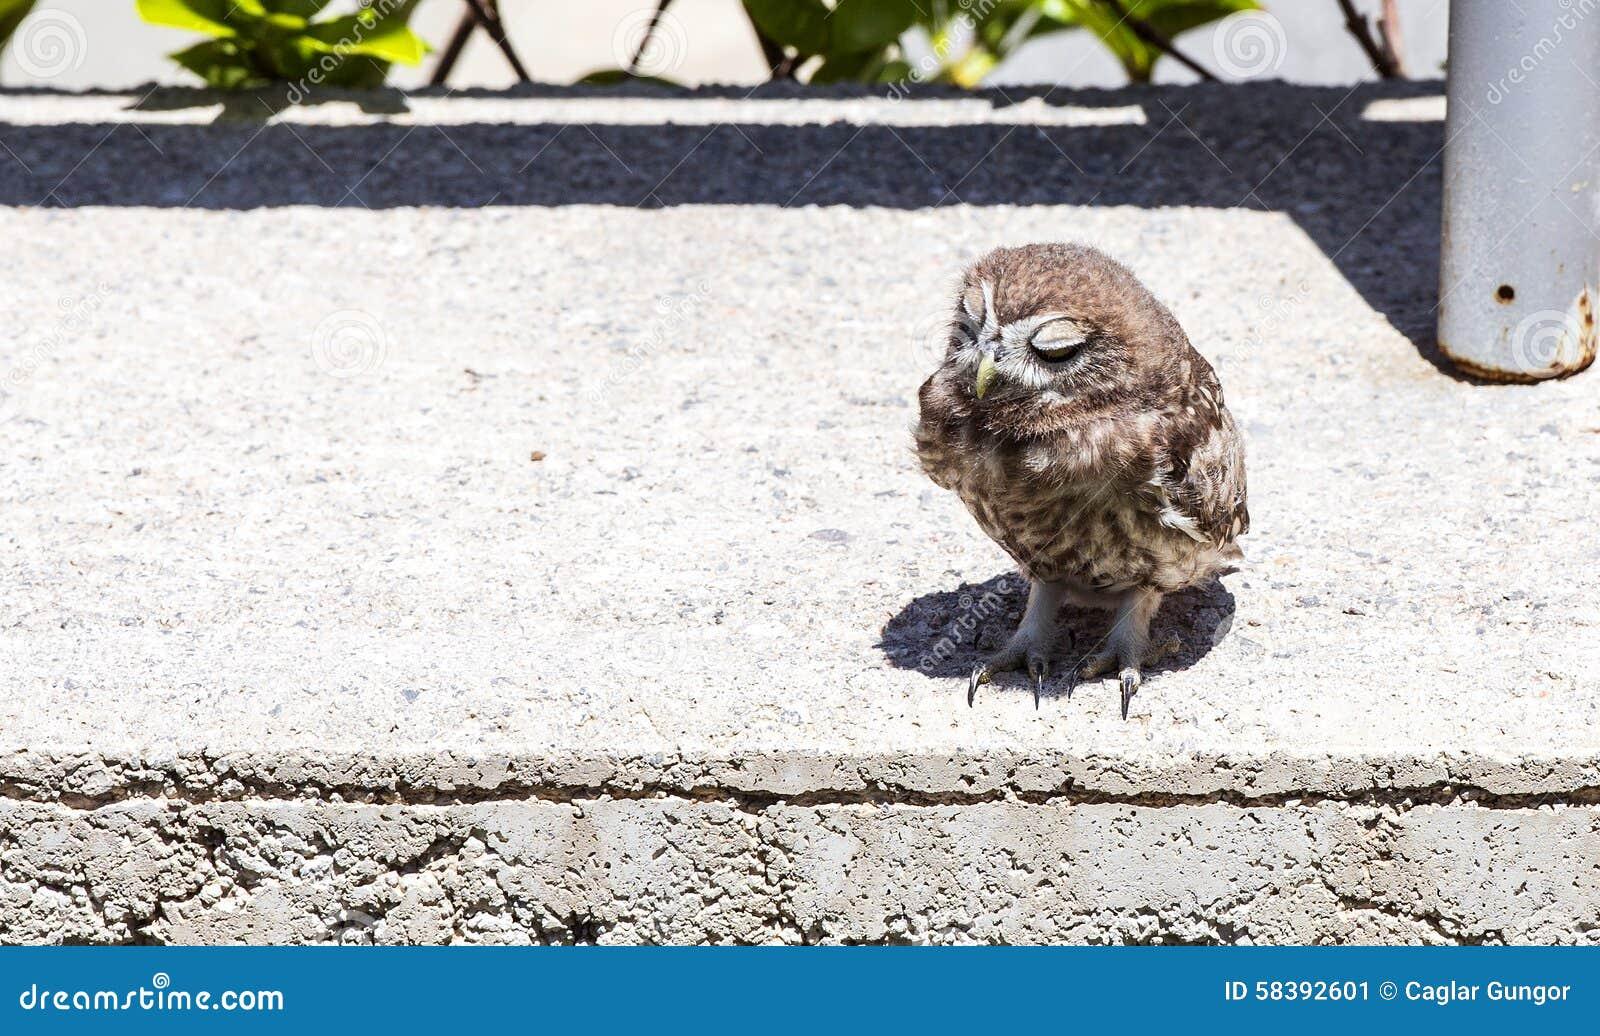 Baby Little Owl Sleeping Stock Image Image Of Bill Feather 58392601